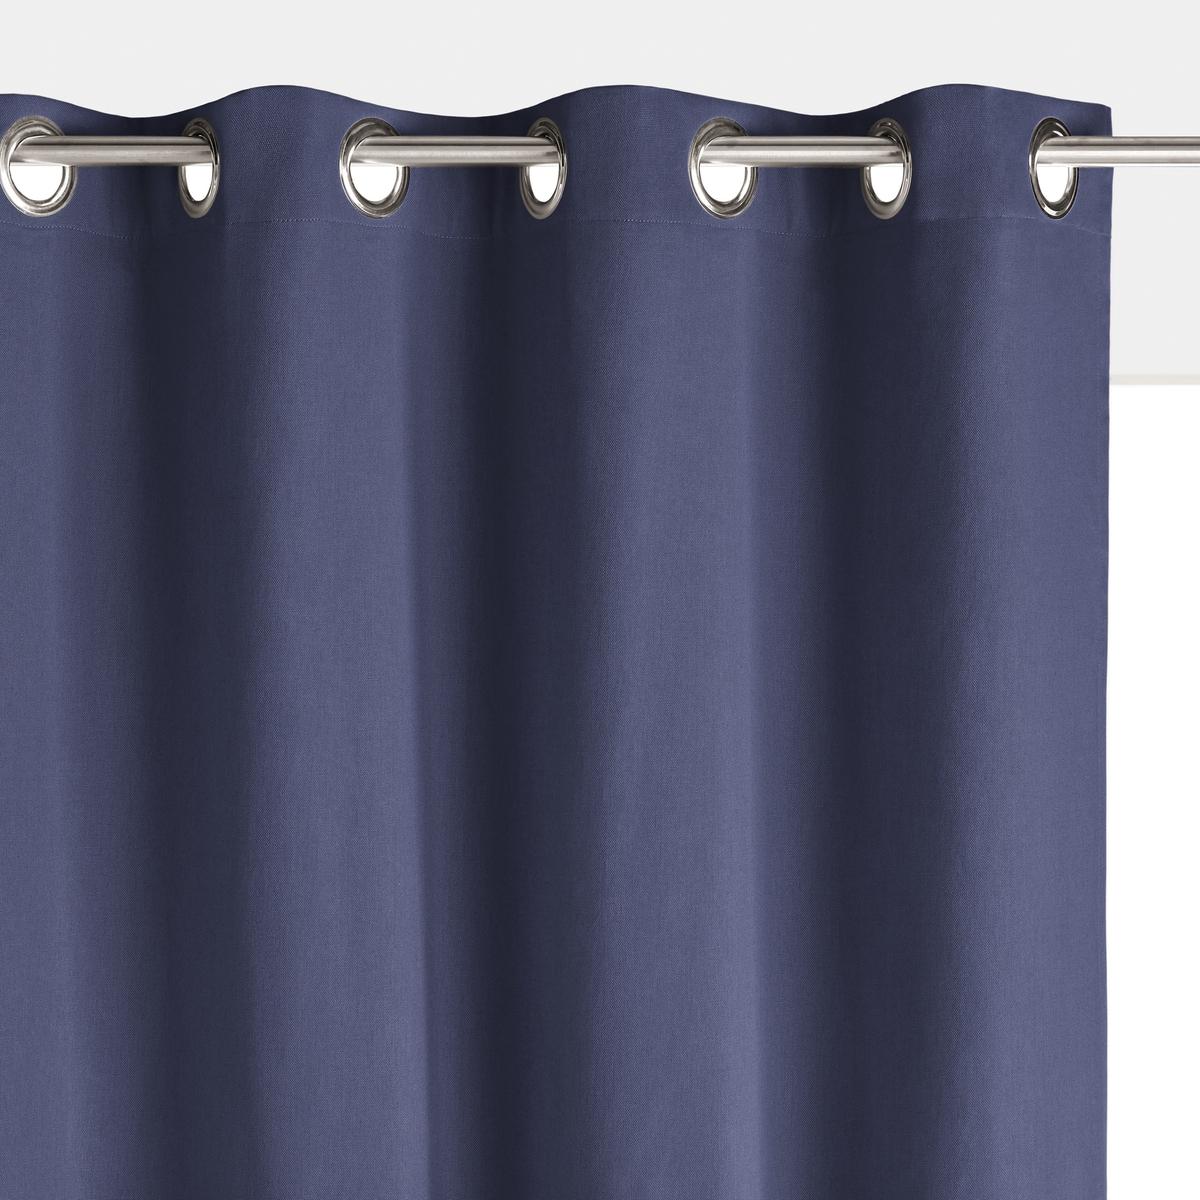 Штора La Redoute Затемняющая с люверсами из хлопка SCENARIO 350 x 135 см синий штора с люверсами 100% хлопок aron